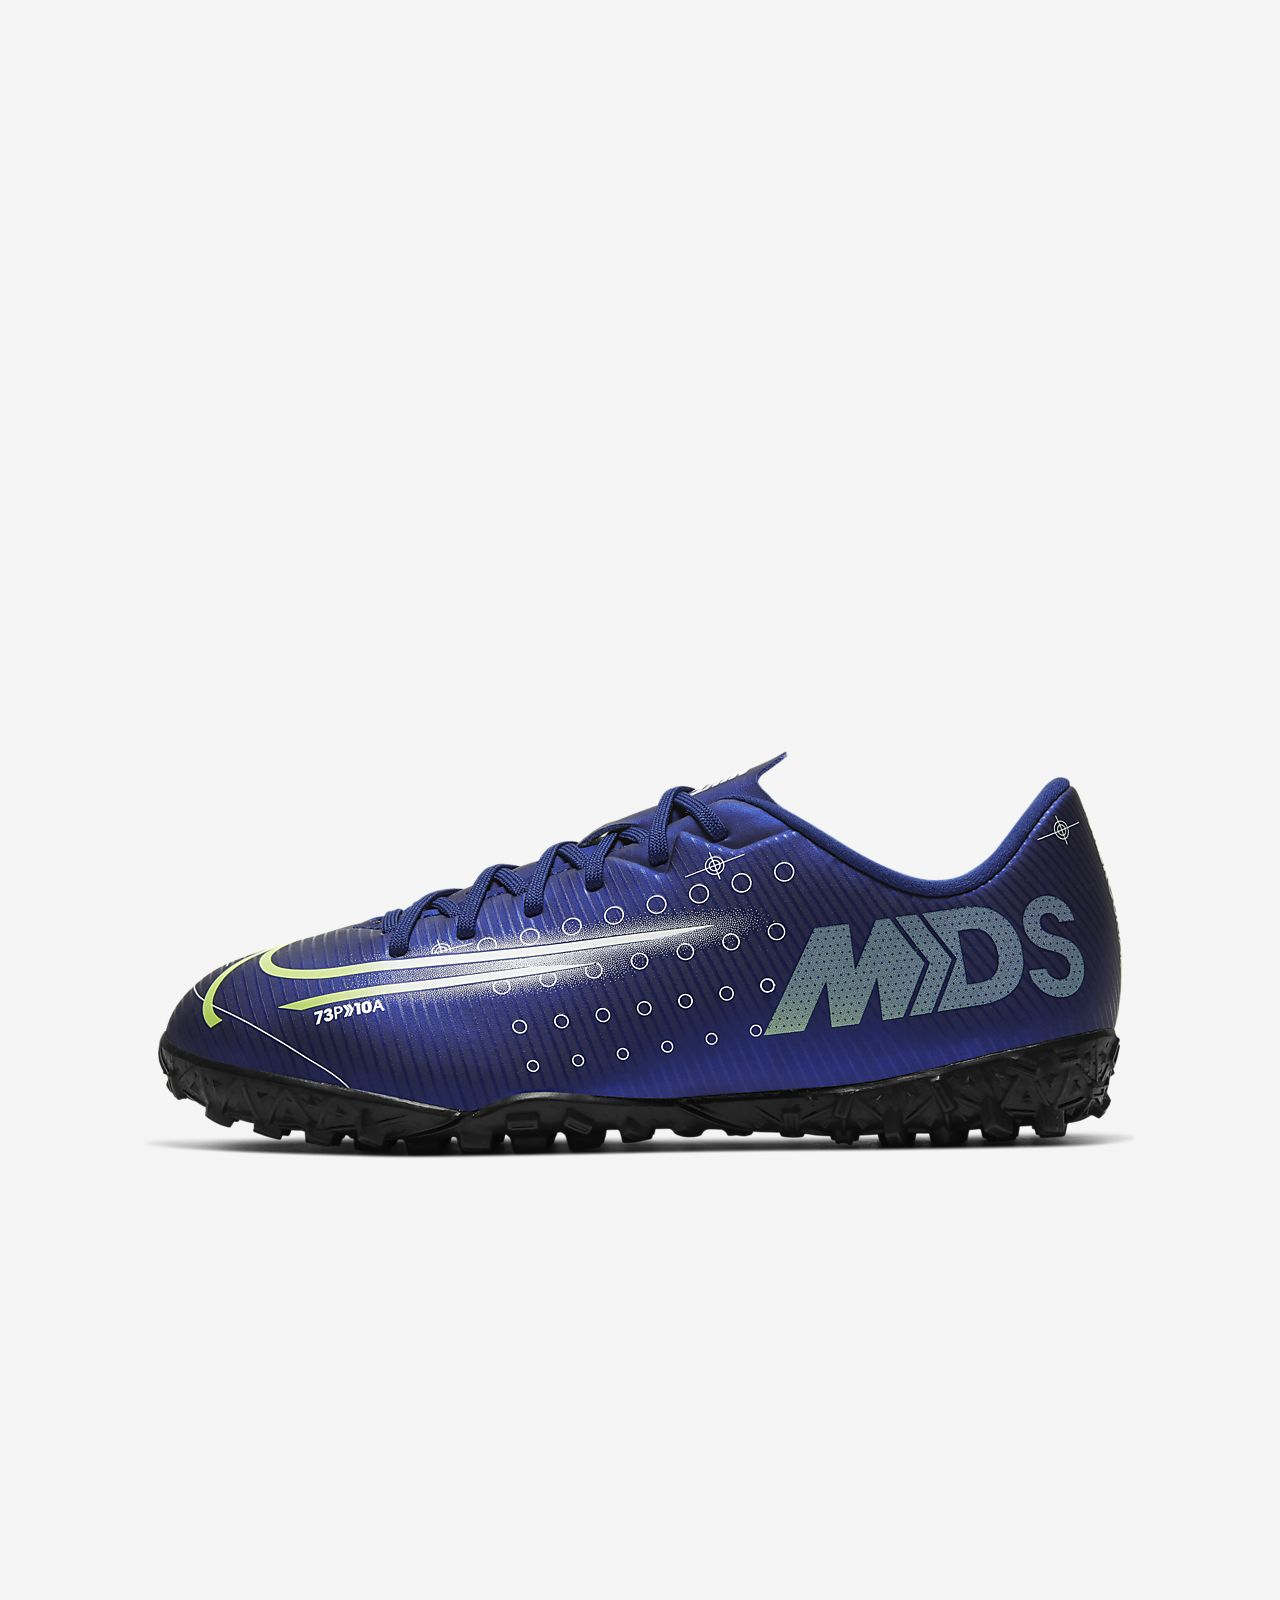 Nike Jr. Mercurial Vapor 13 Academy MDS TF Botas de fútbol para moqueta - Turf artificial - Niño/a y niño/a pequeño/a